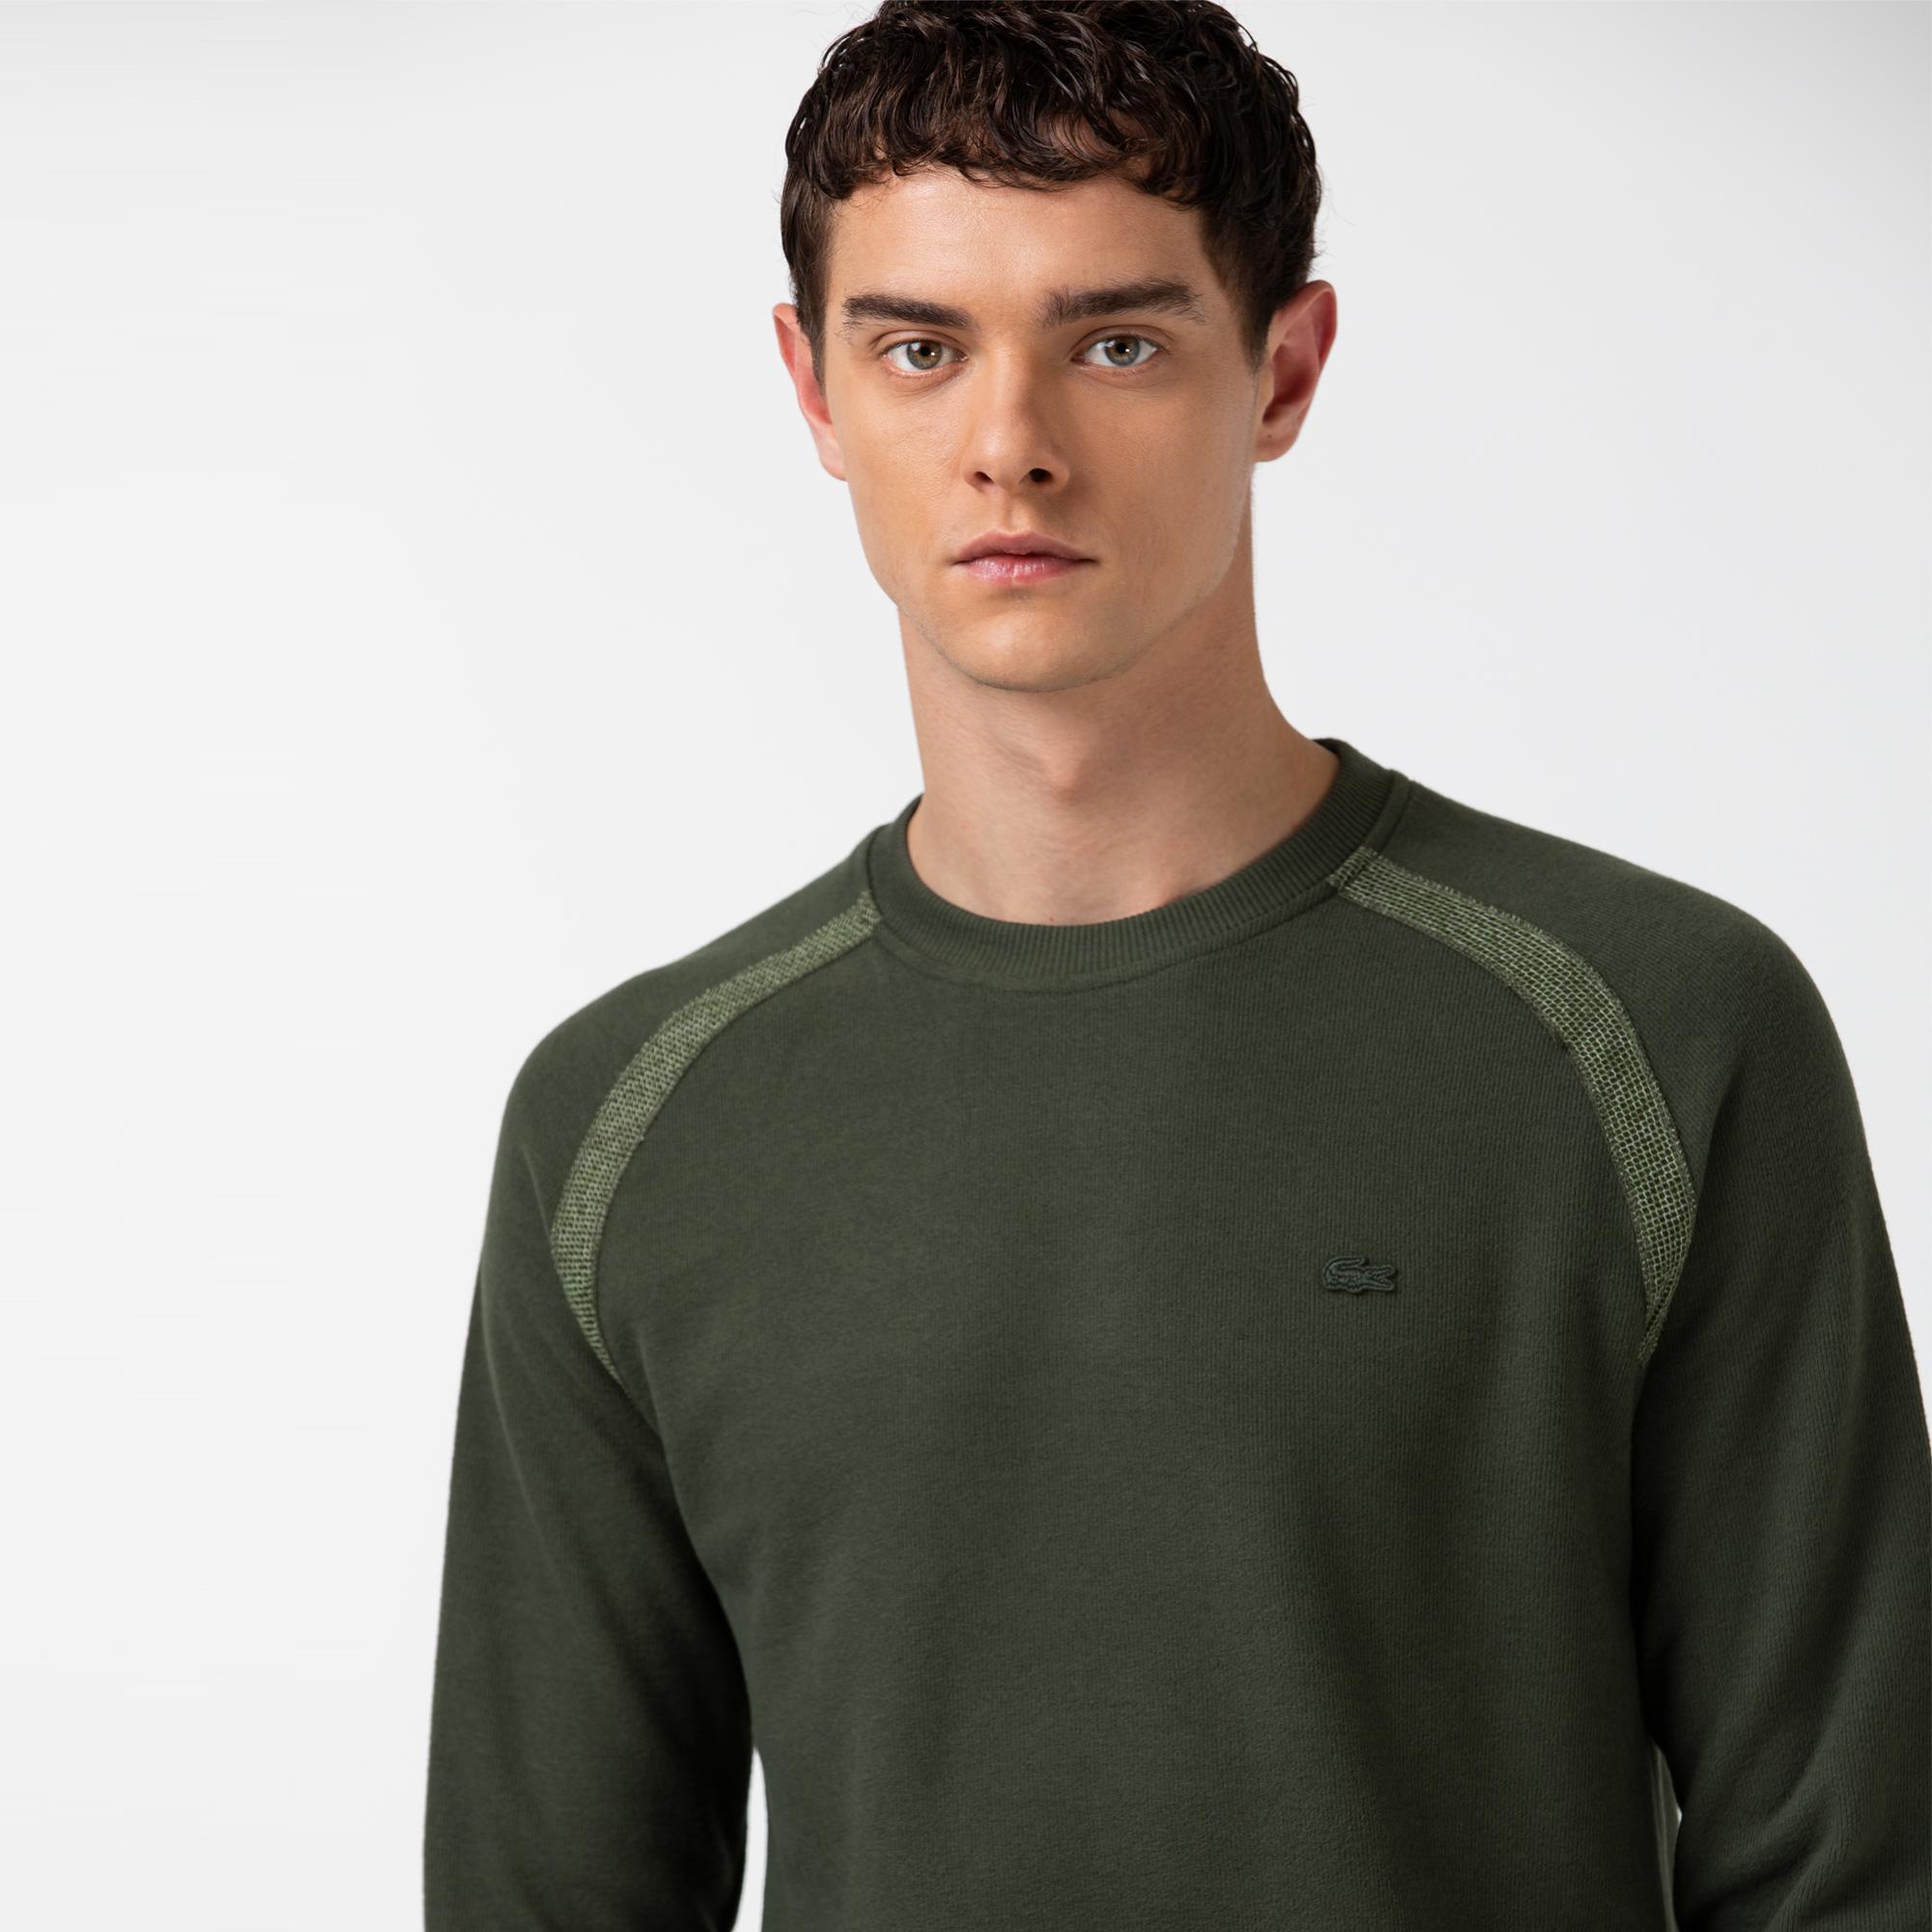 Lacoste Erkek Bisiklet Yaka Uzun Kollu Haki T-Shirt